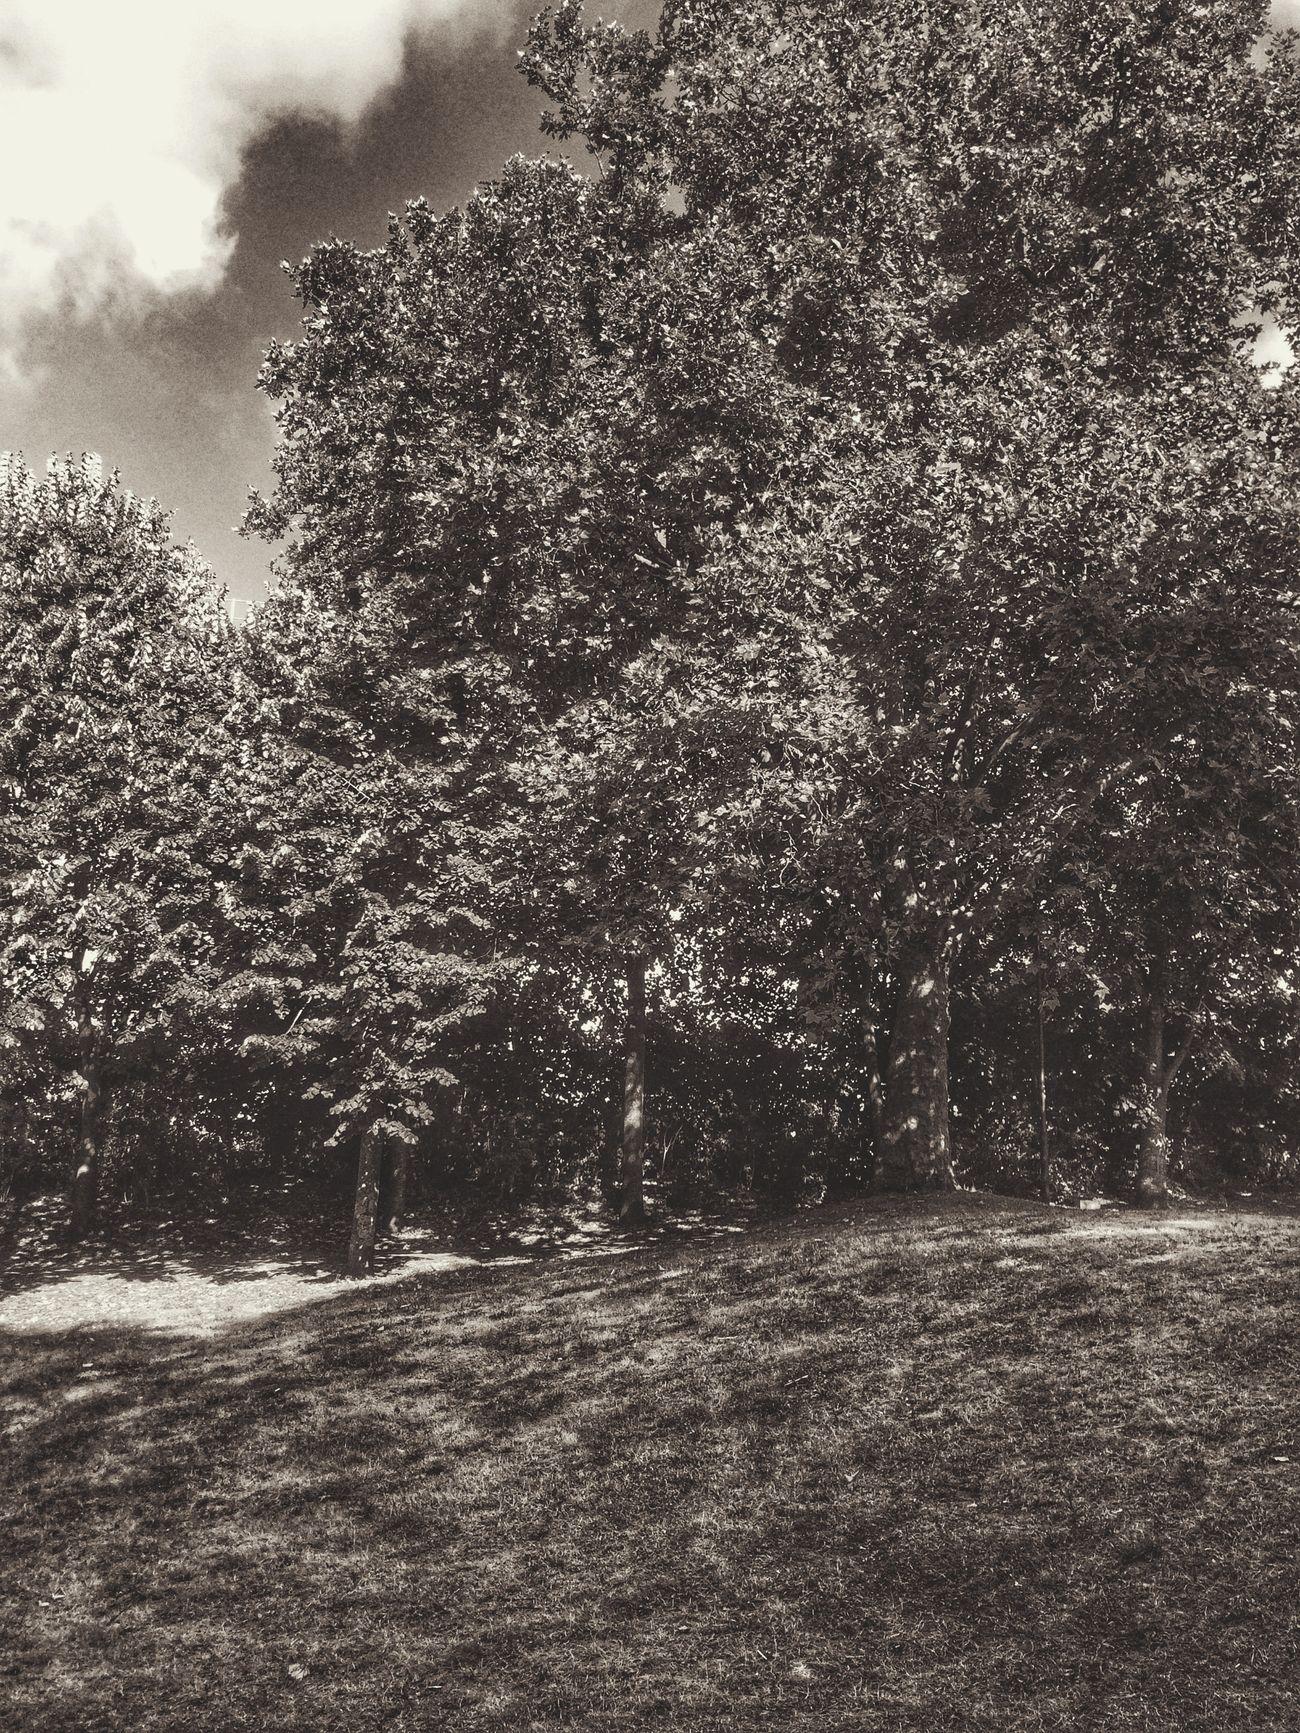 Coulée Verte Tree